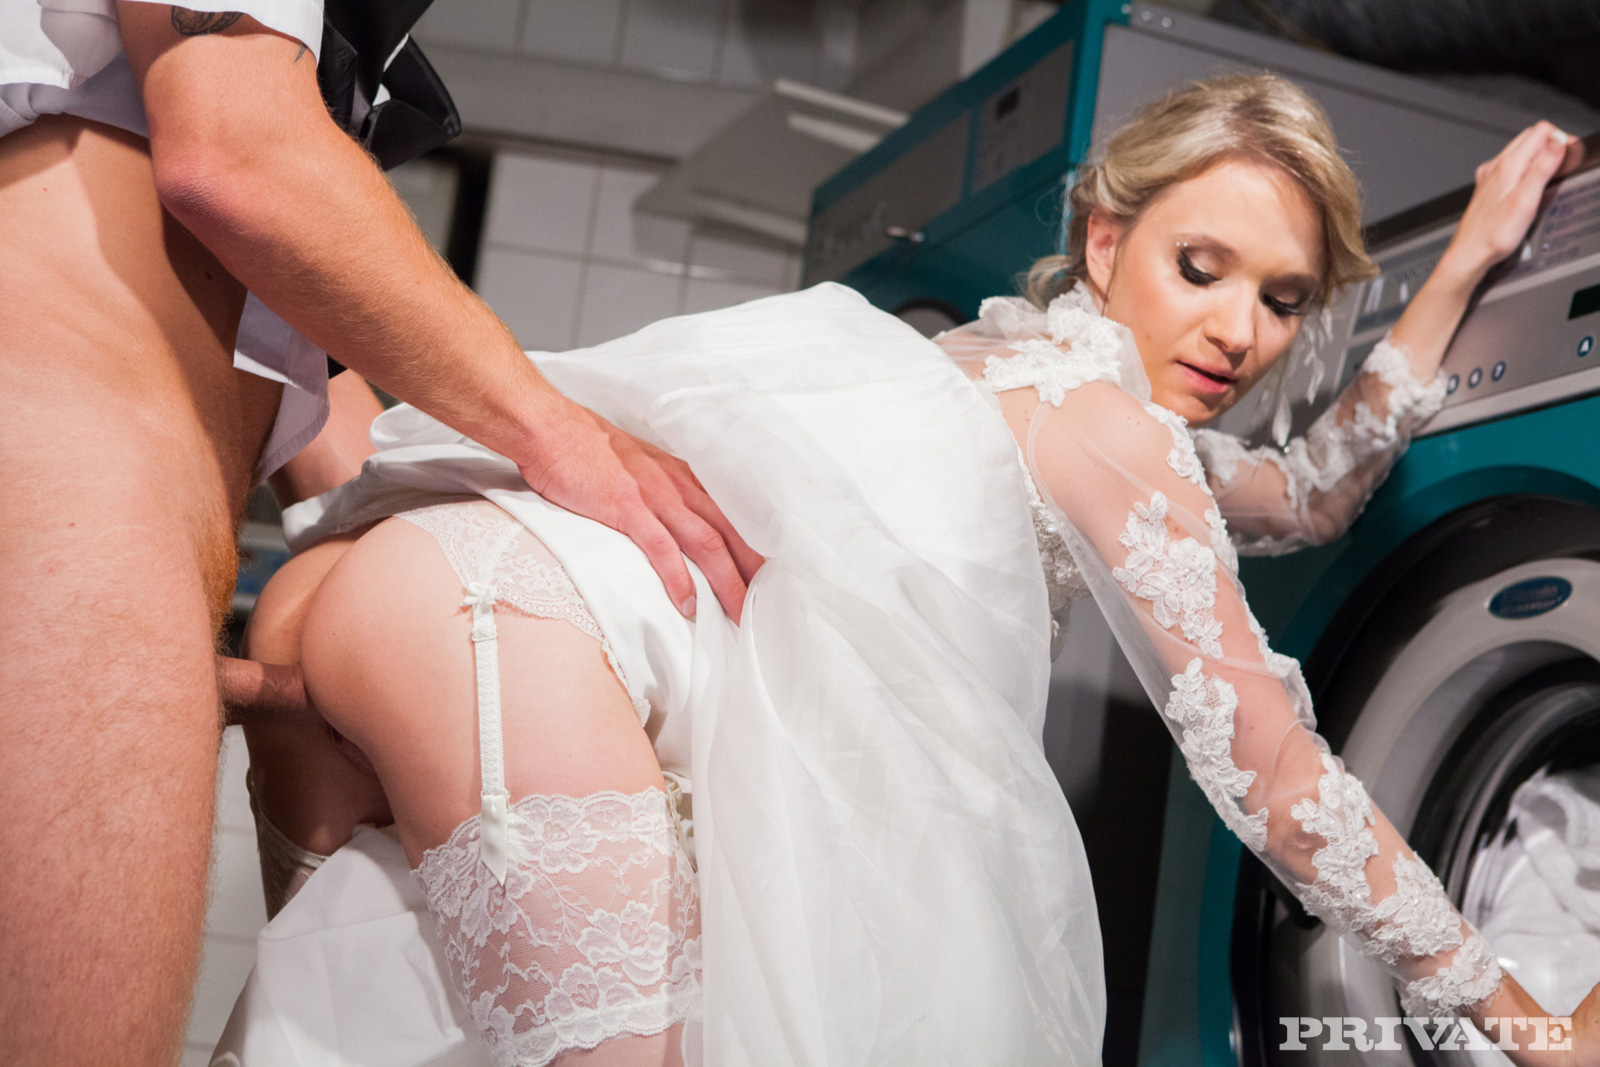 Невесту трахают на празднике онлайн